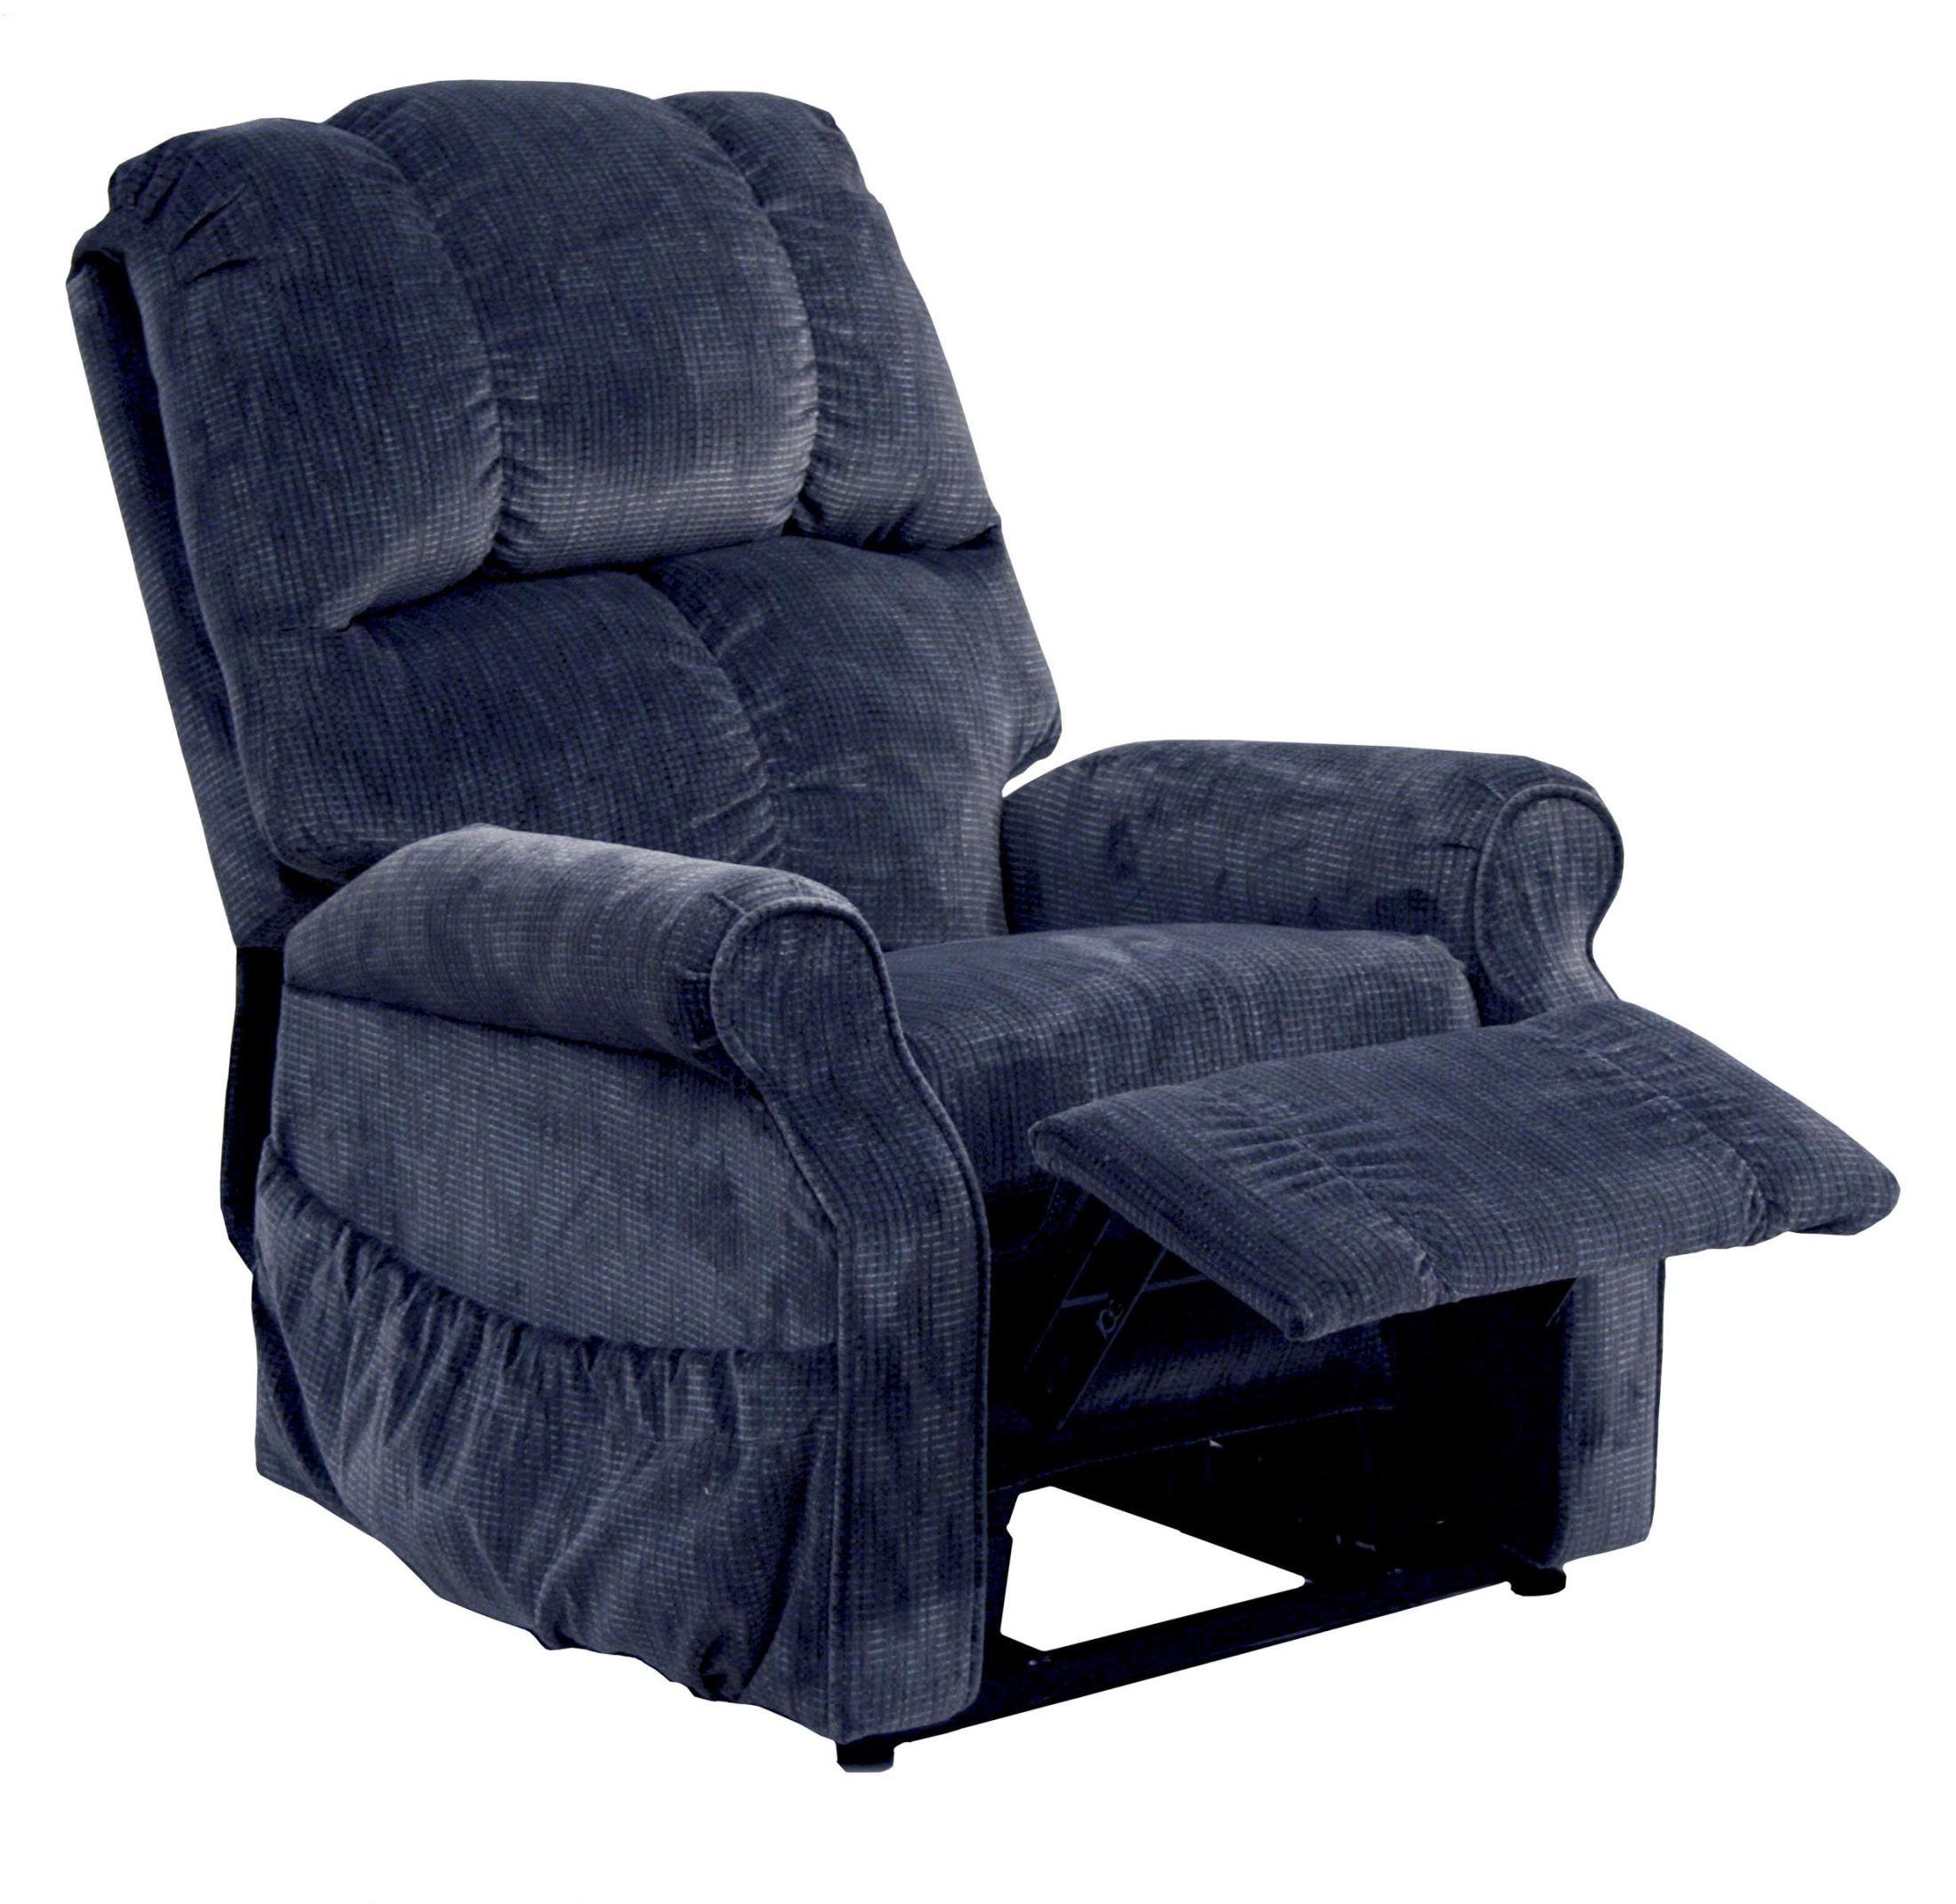 Catnapper Lift Chair Power Chair Lifts Micro Power Chair